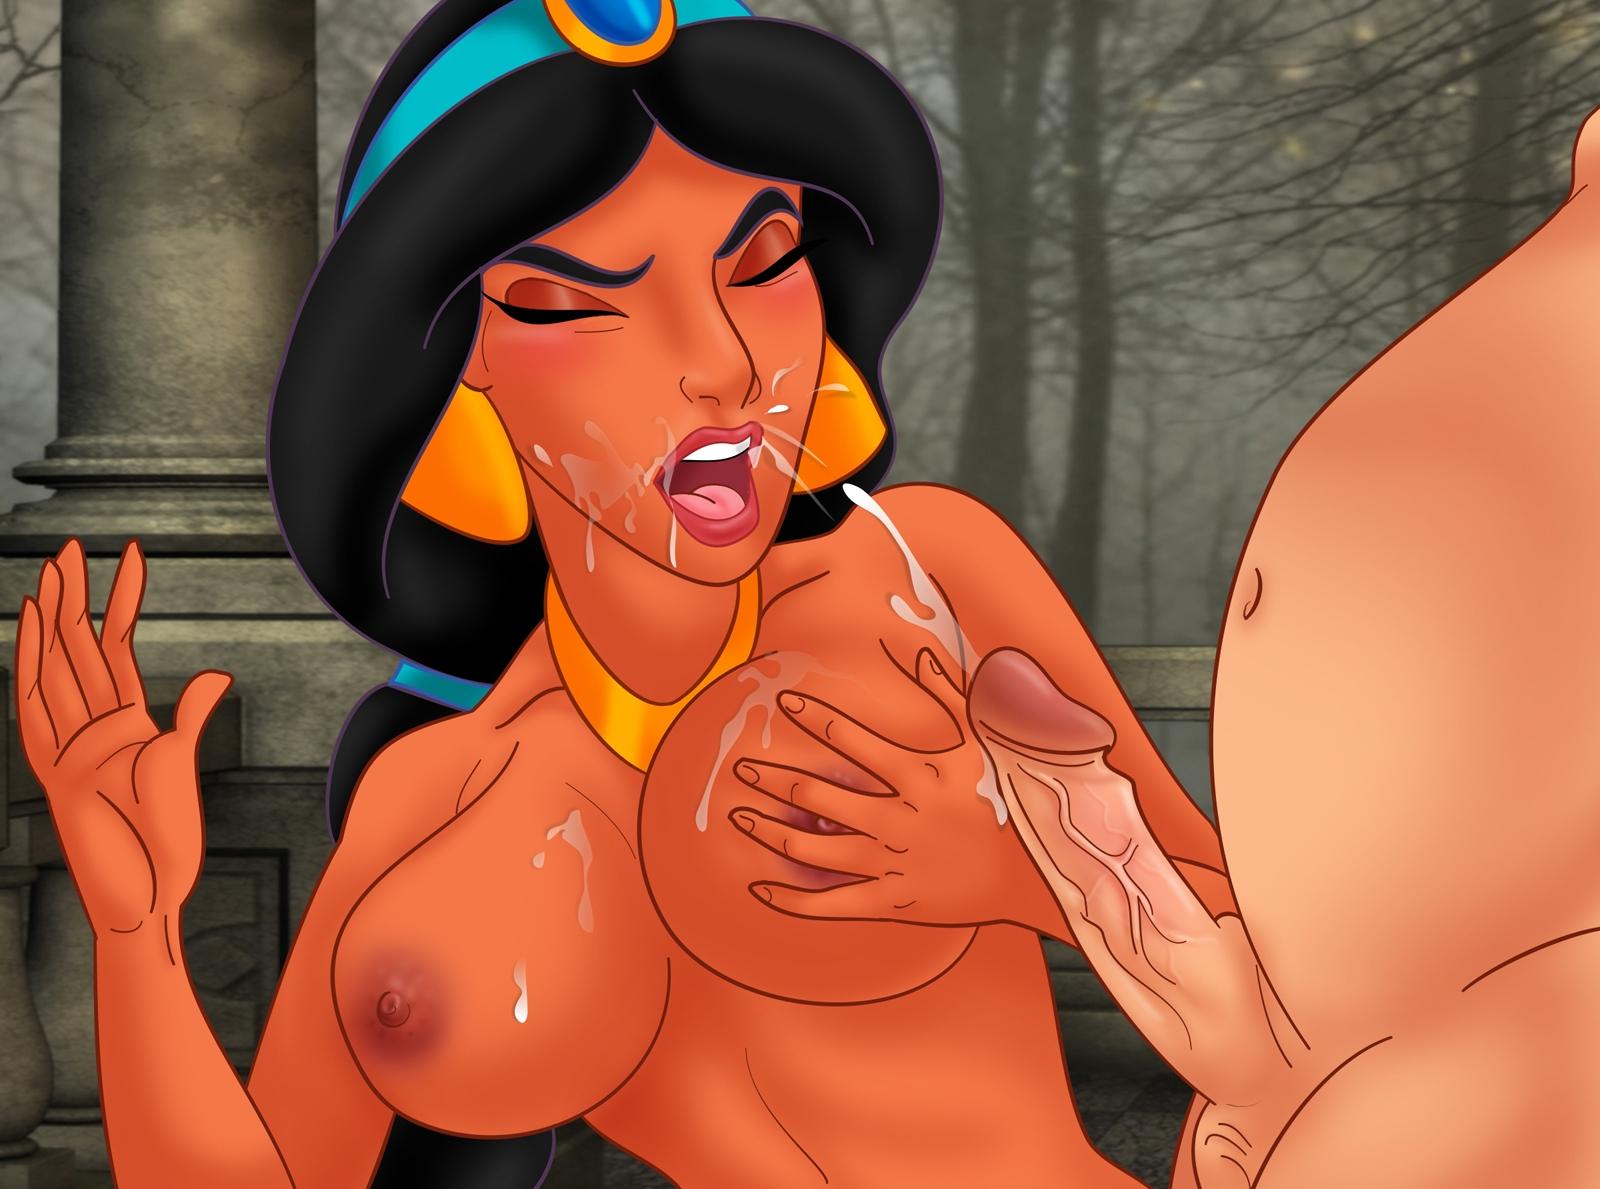 Disney Princess Cum Porn